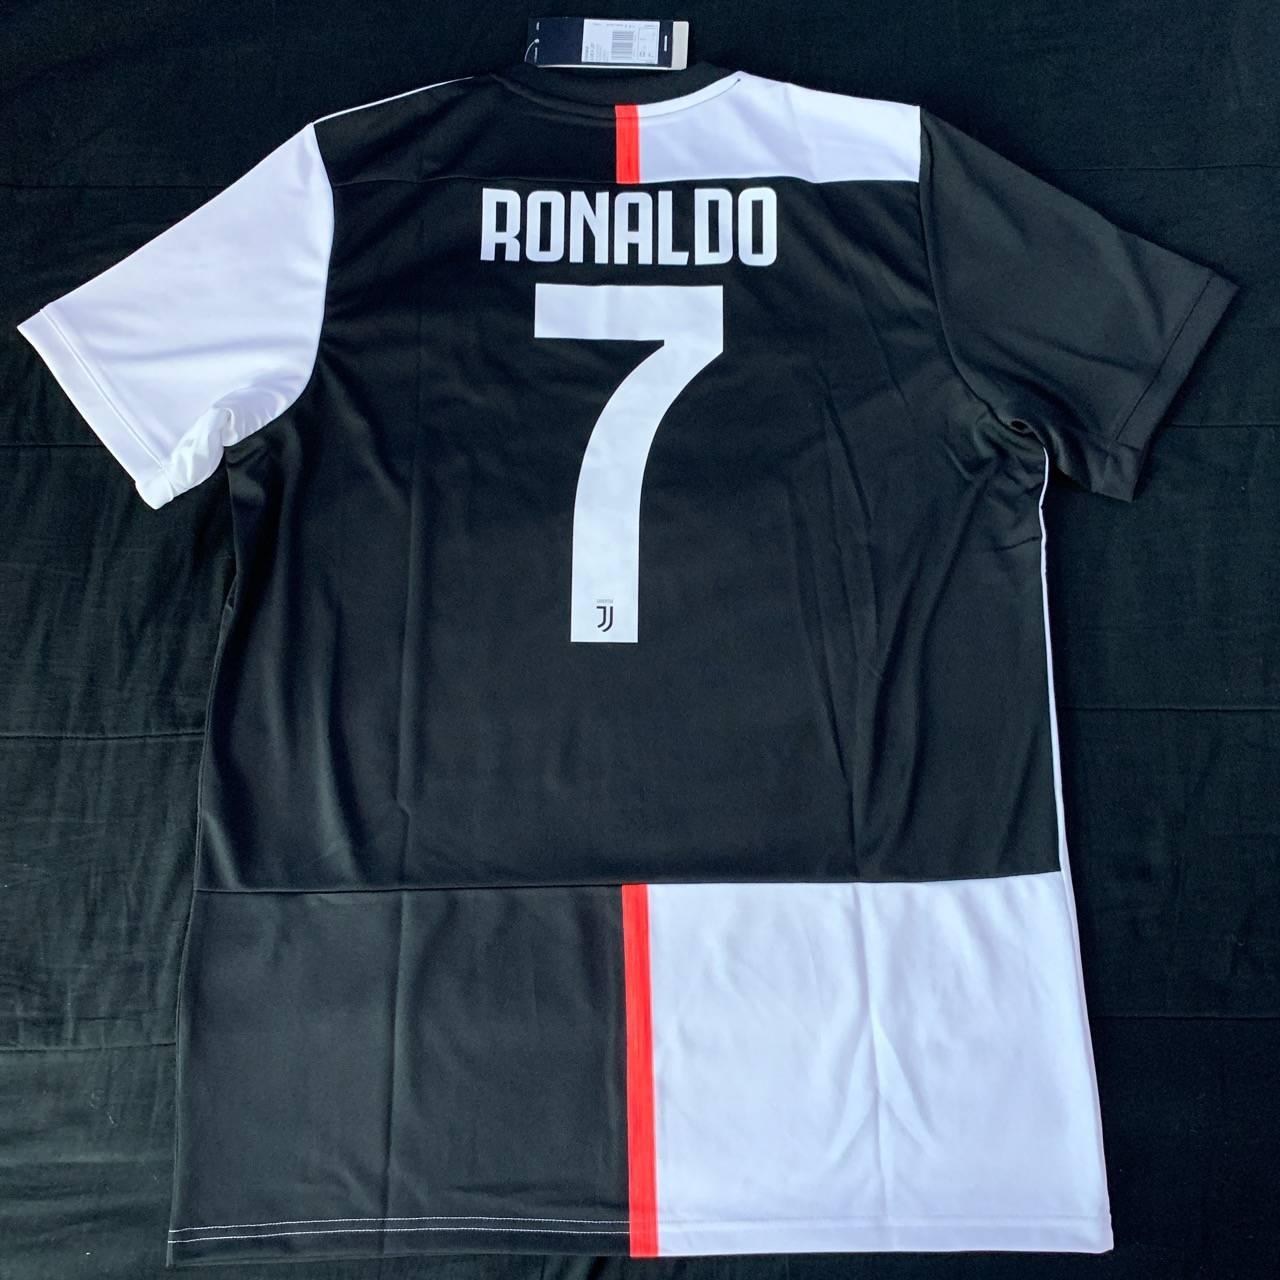 Adidas Juventus Ronaldo 7 2019-2020 Home Jersey